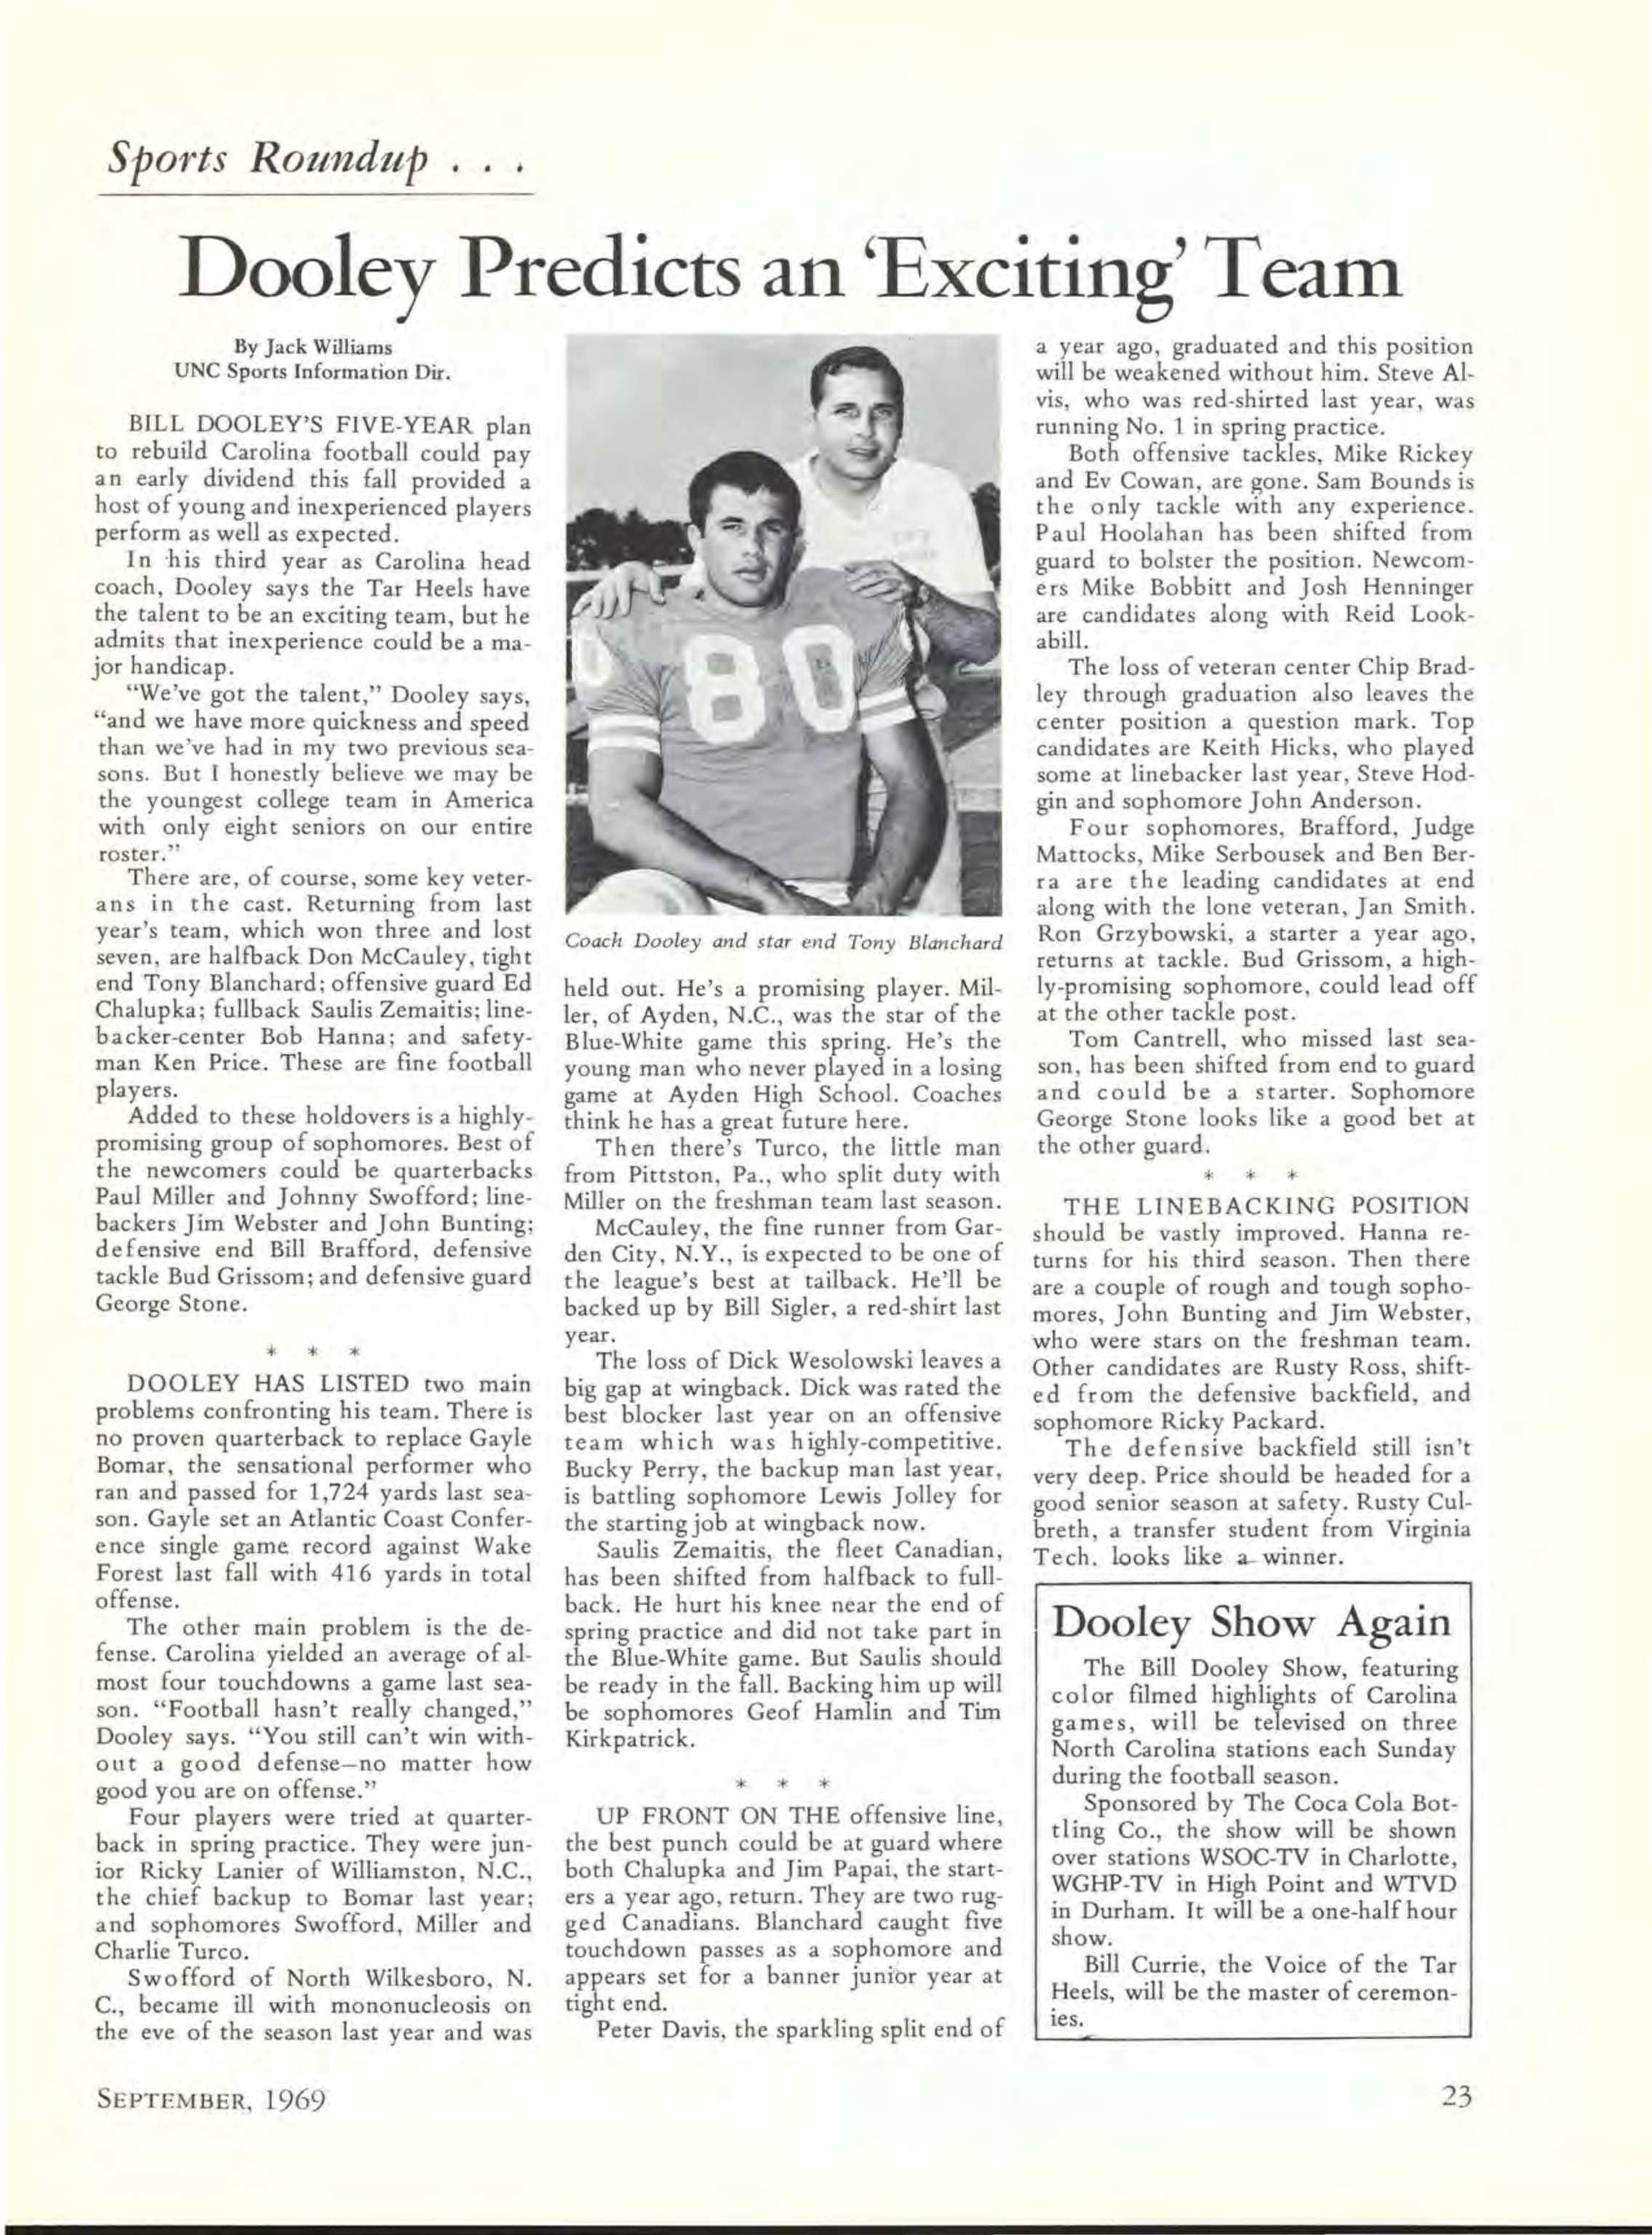 Carolina Alumni Review - September 1969 - page 22